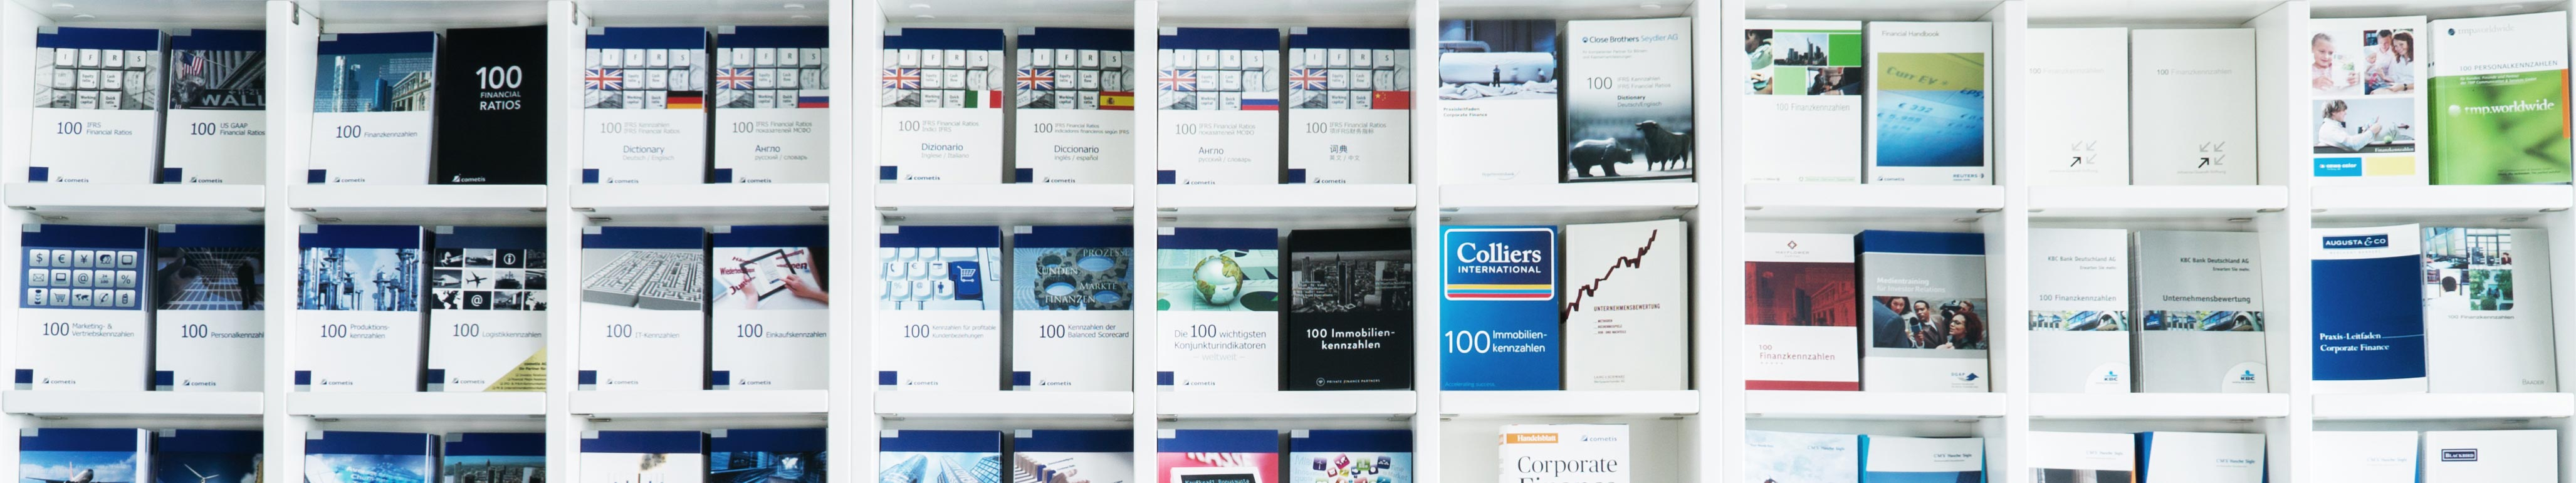 Limited Editions Shop Frankfurt City